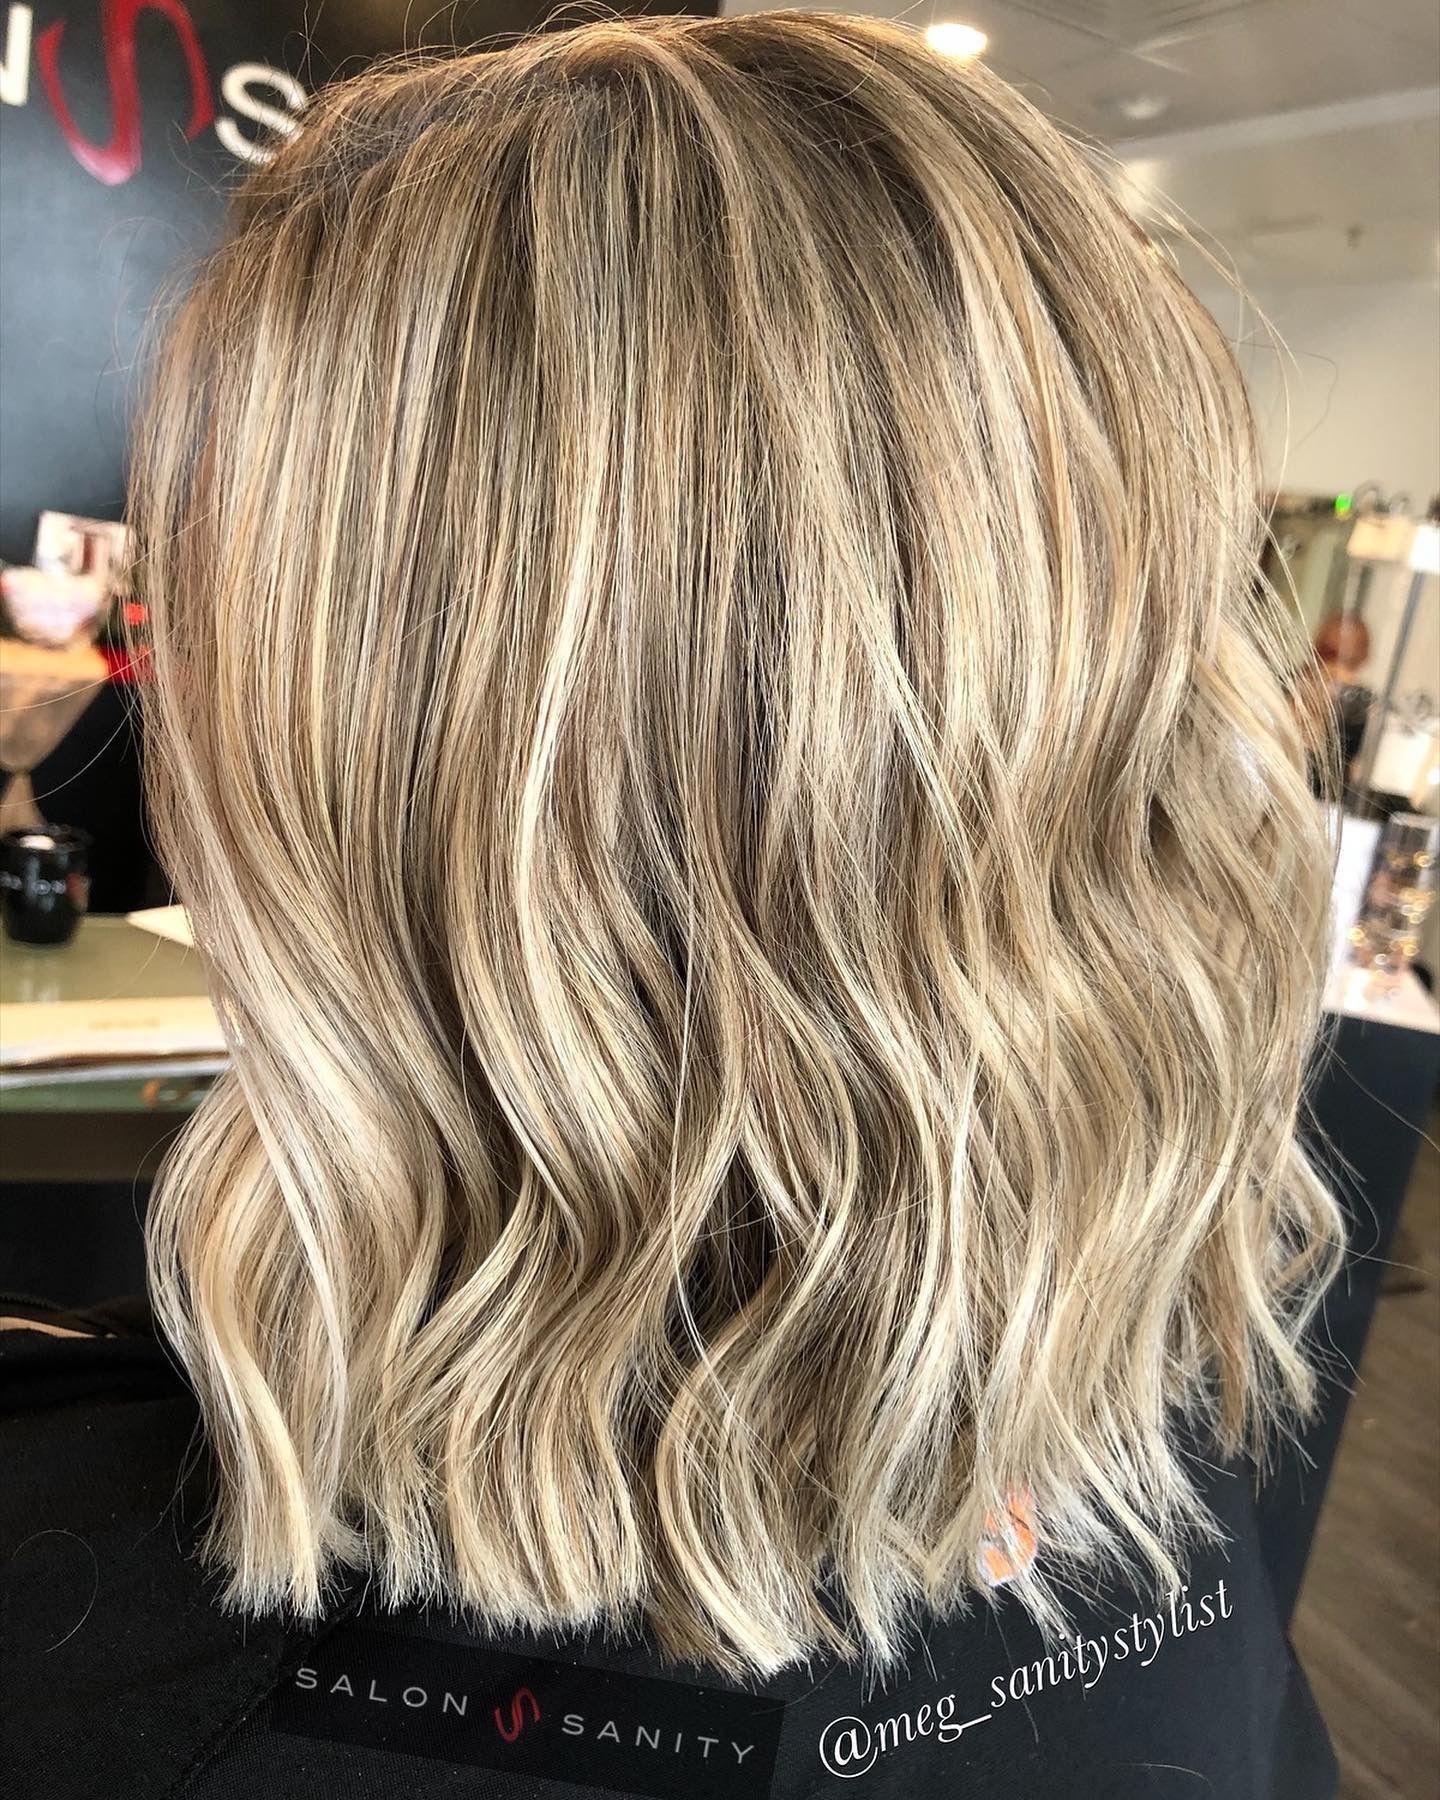 Short Blonde Dimensional Balayage Highlights With Beach Waves Beachwaves Balayage Shorthair Blondebalayage Salonsa In 2020 Modern Haircuts Hair Long Hair Styles